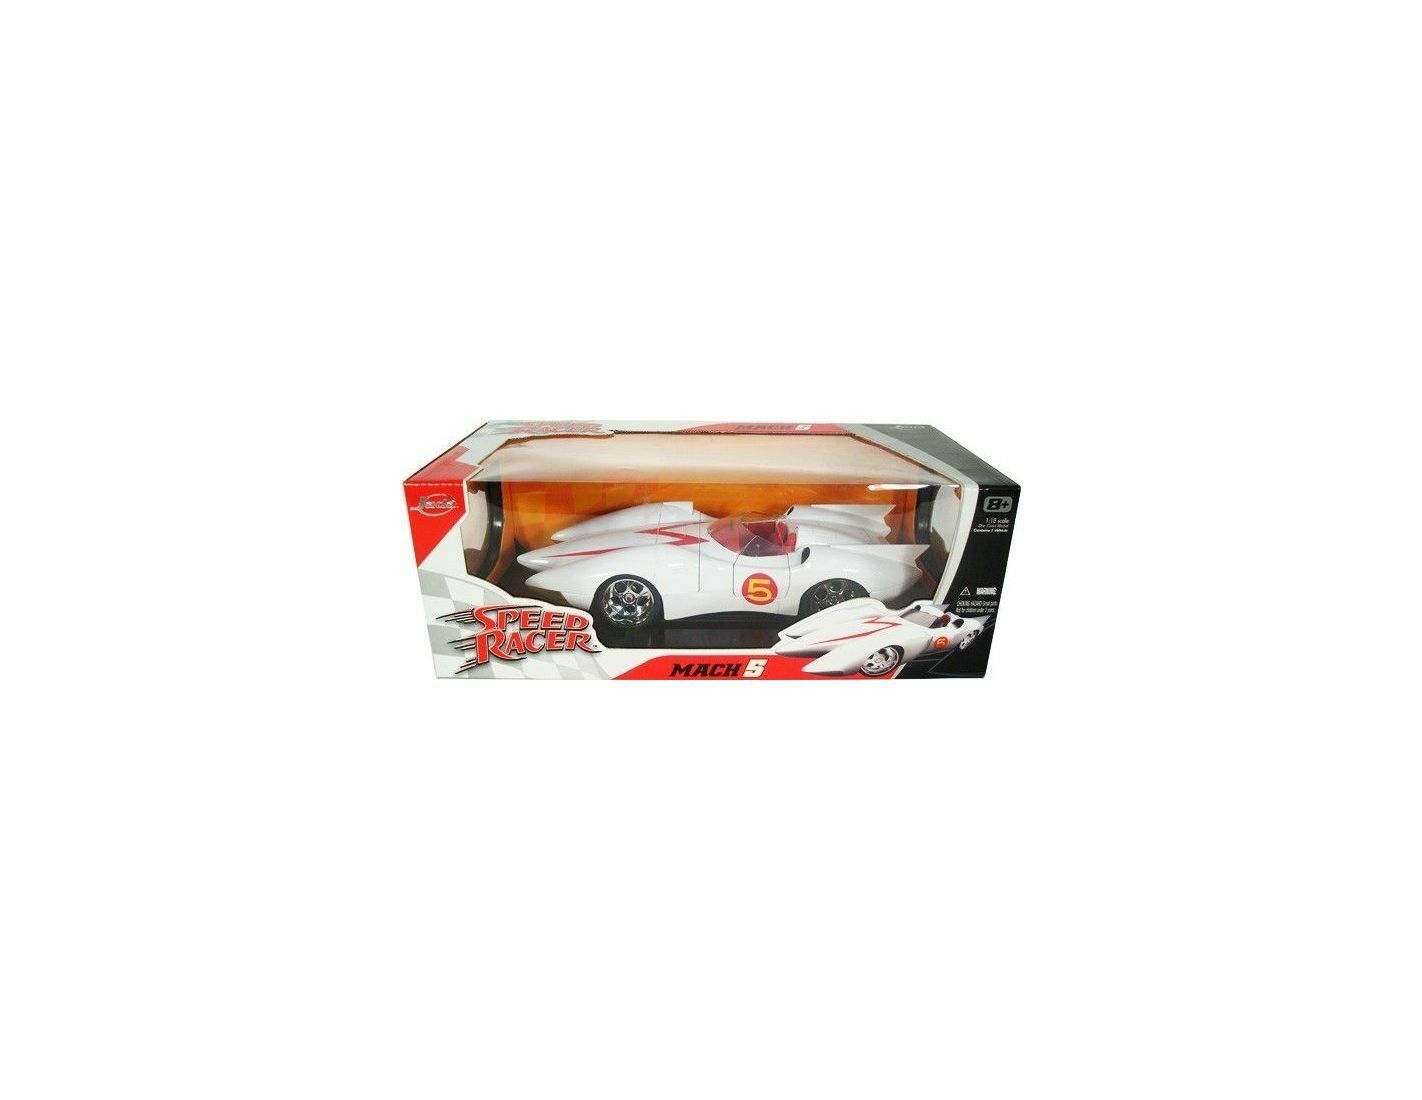 Jada JADA91879 SPEED RACER MACH 5 blanc 1 18 Modellino